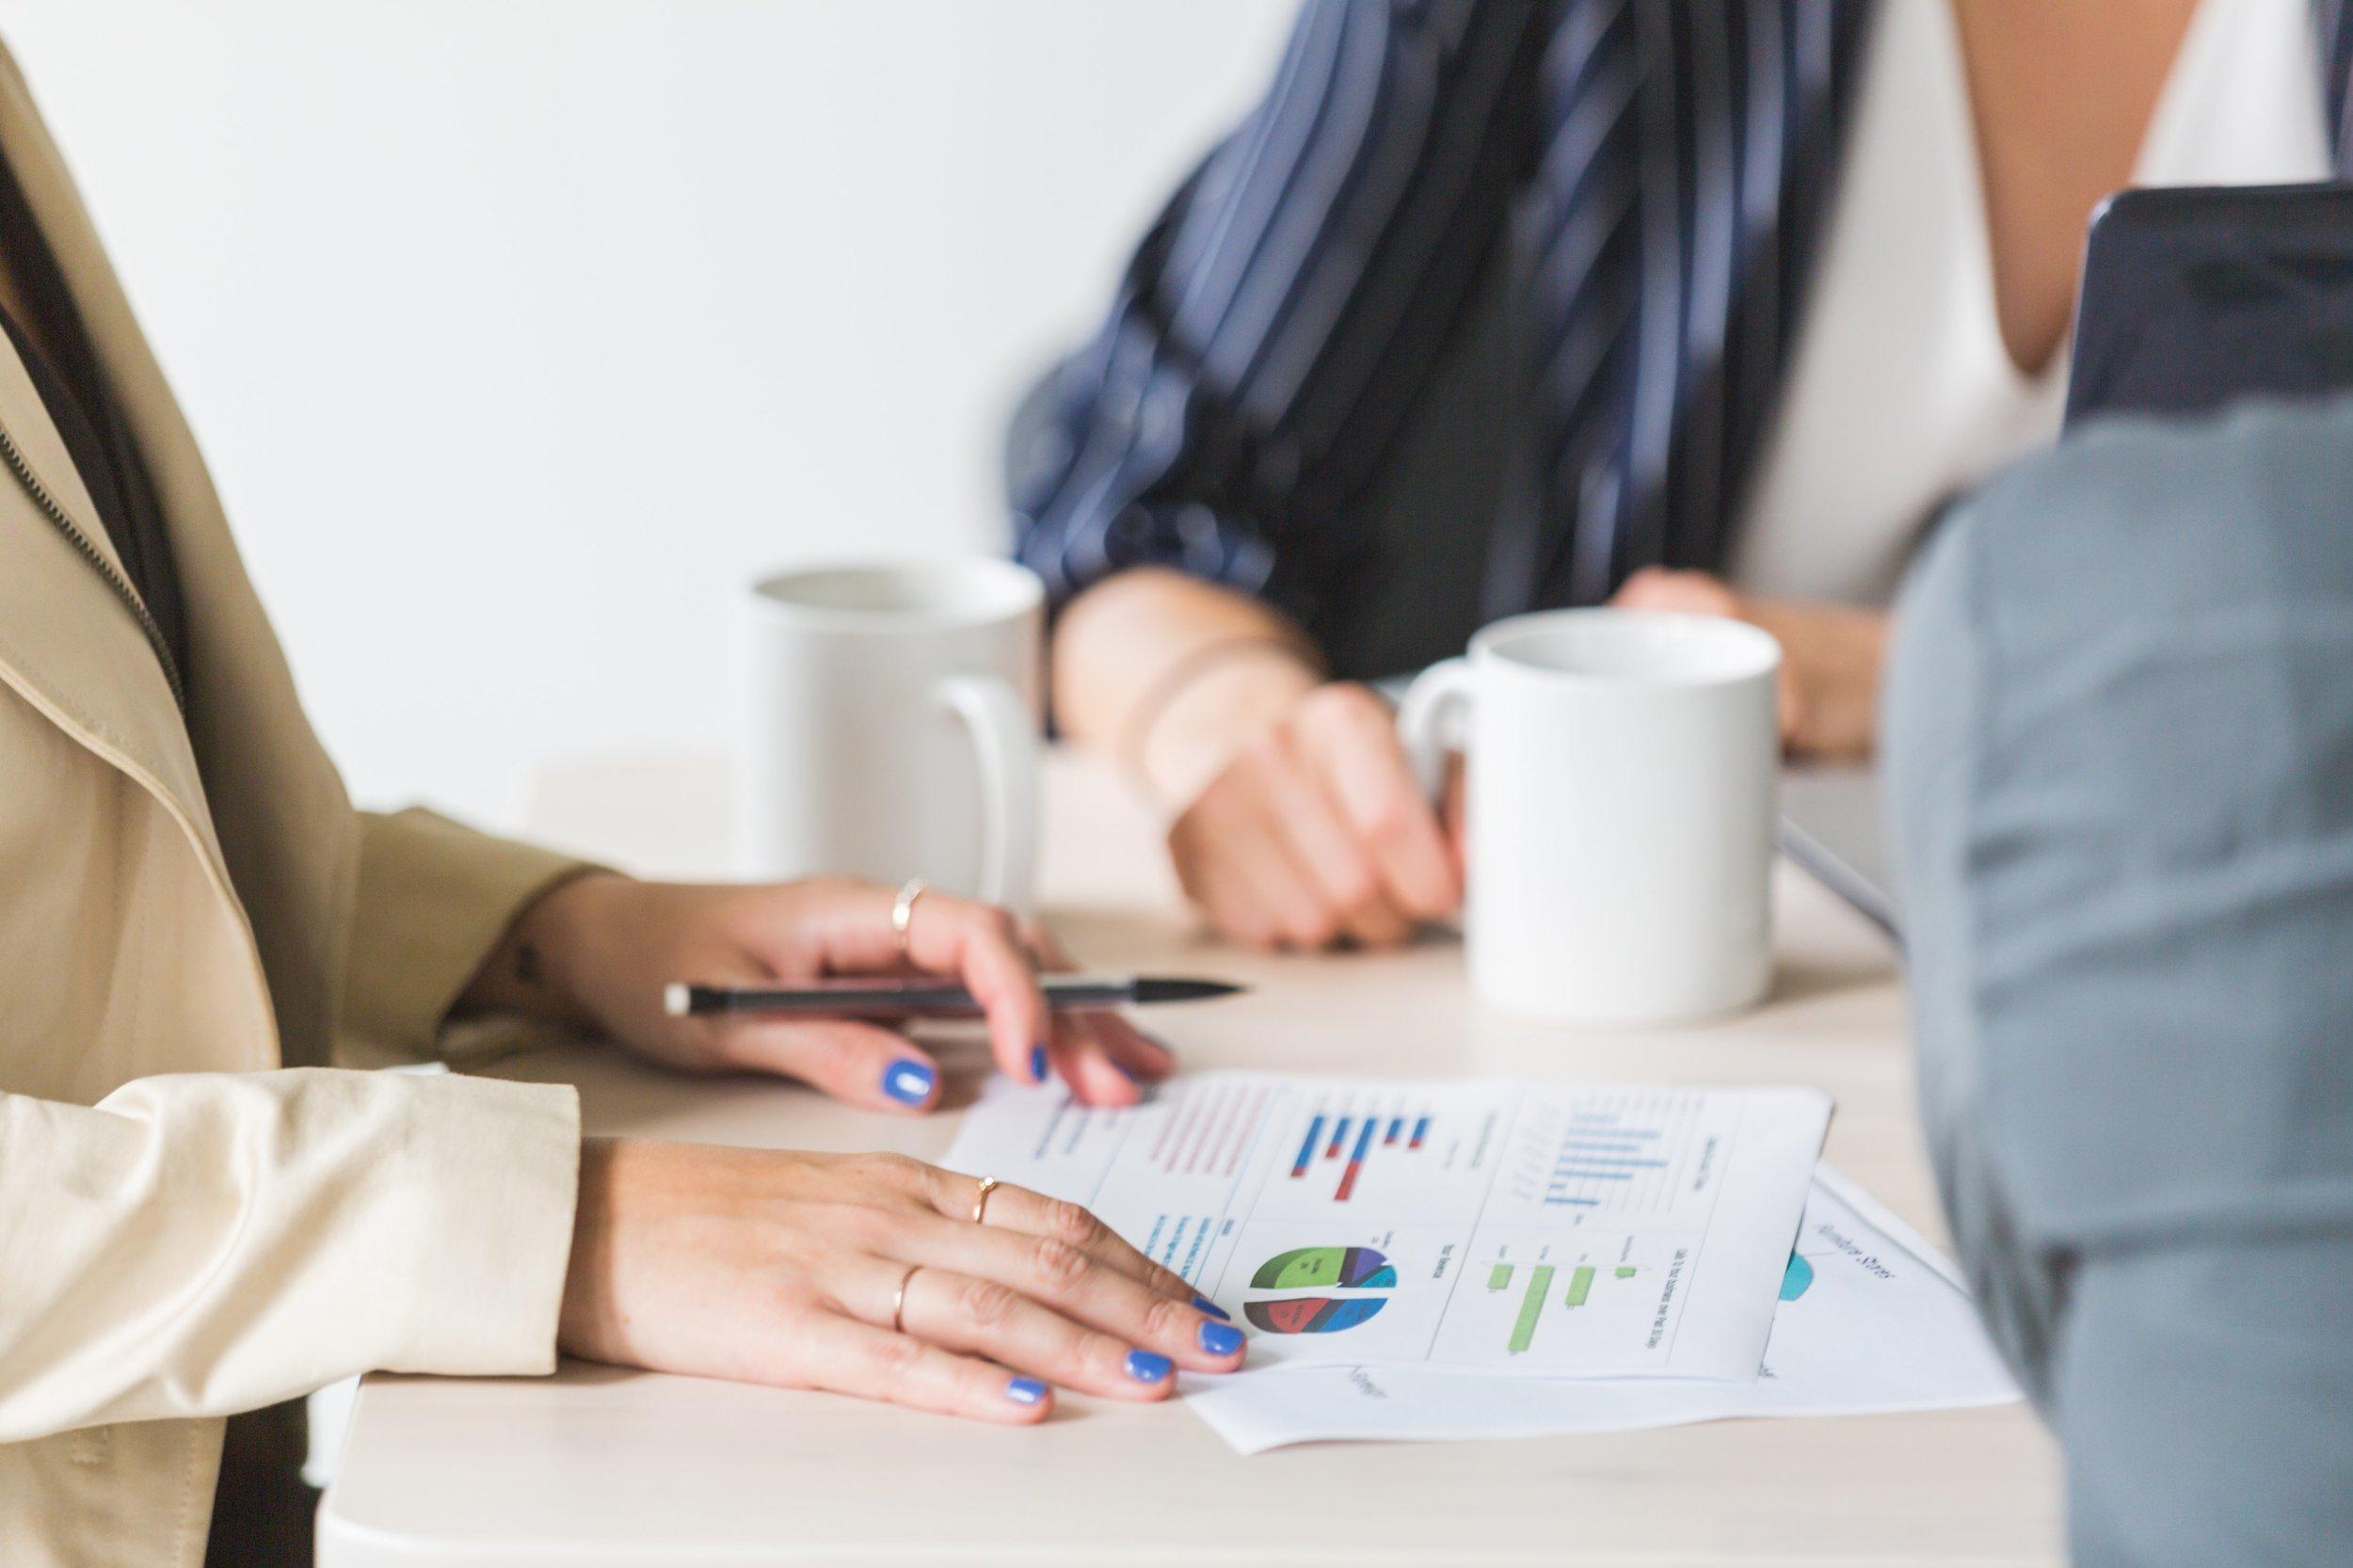 reading-charts-at-business-meeting_4460x4460.jpg